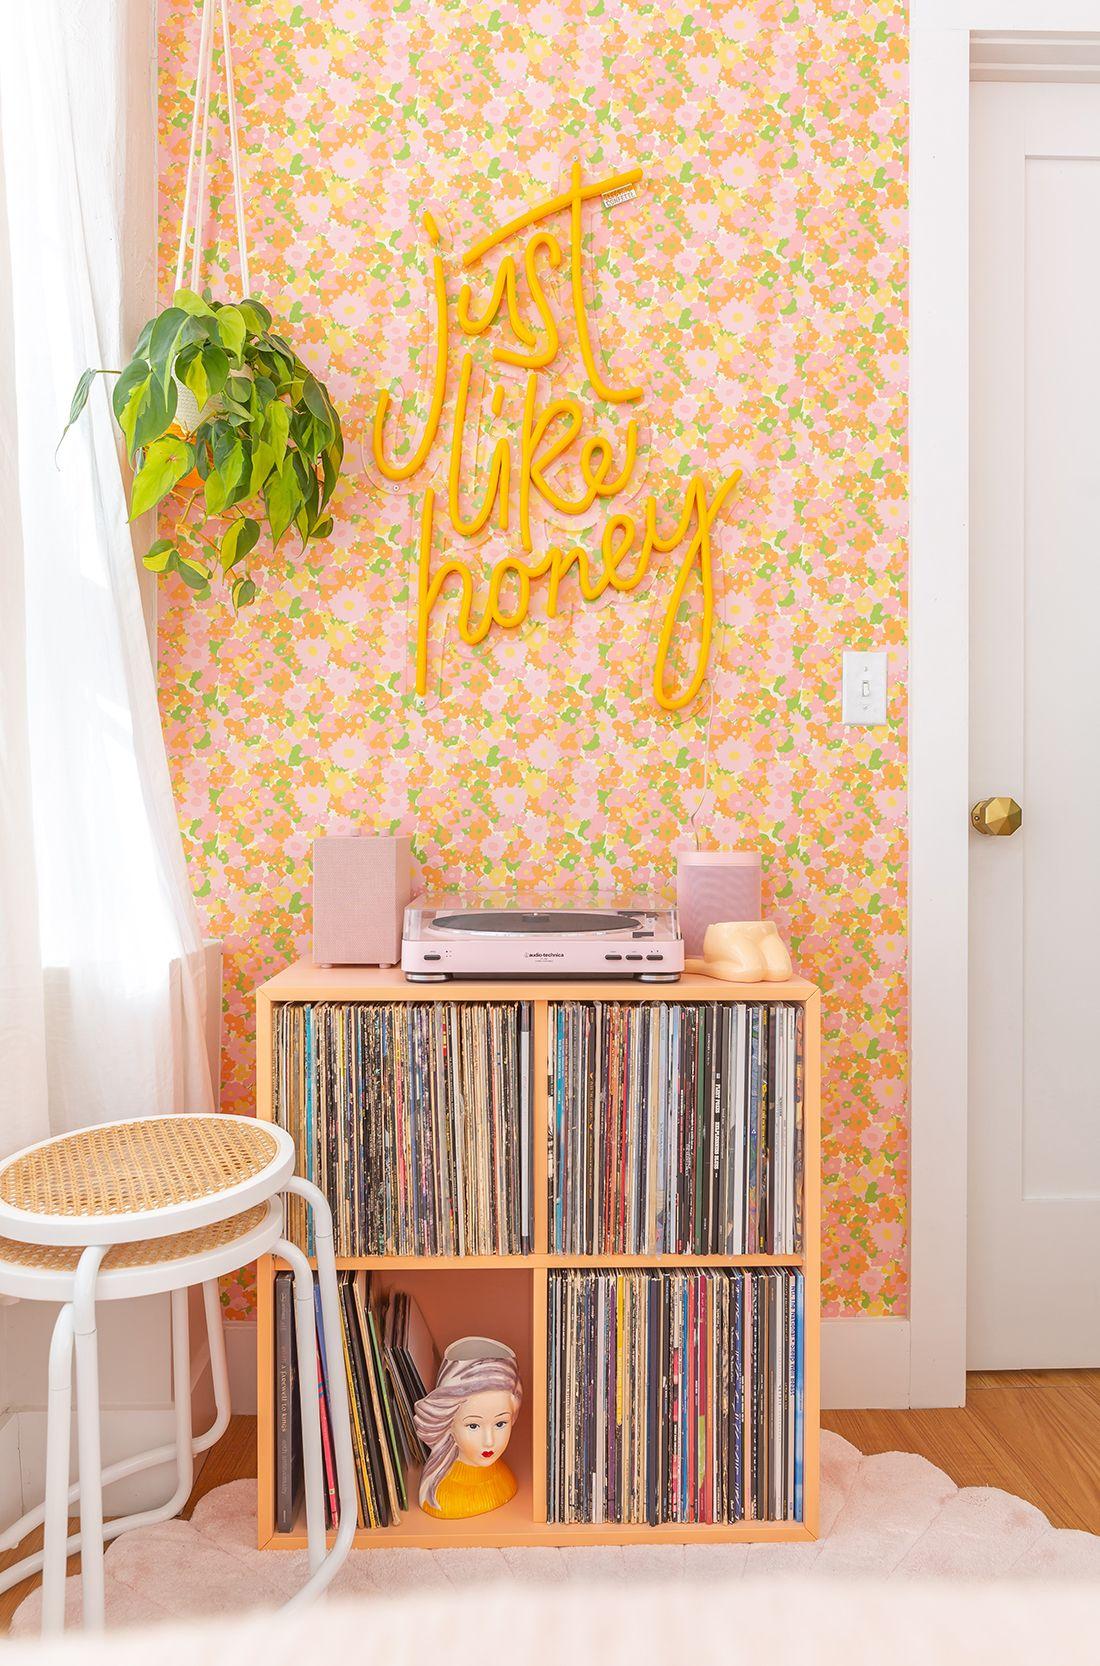 #Awwpartment: Retro Bedroom Reveal!